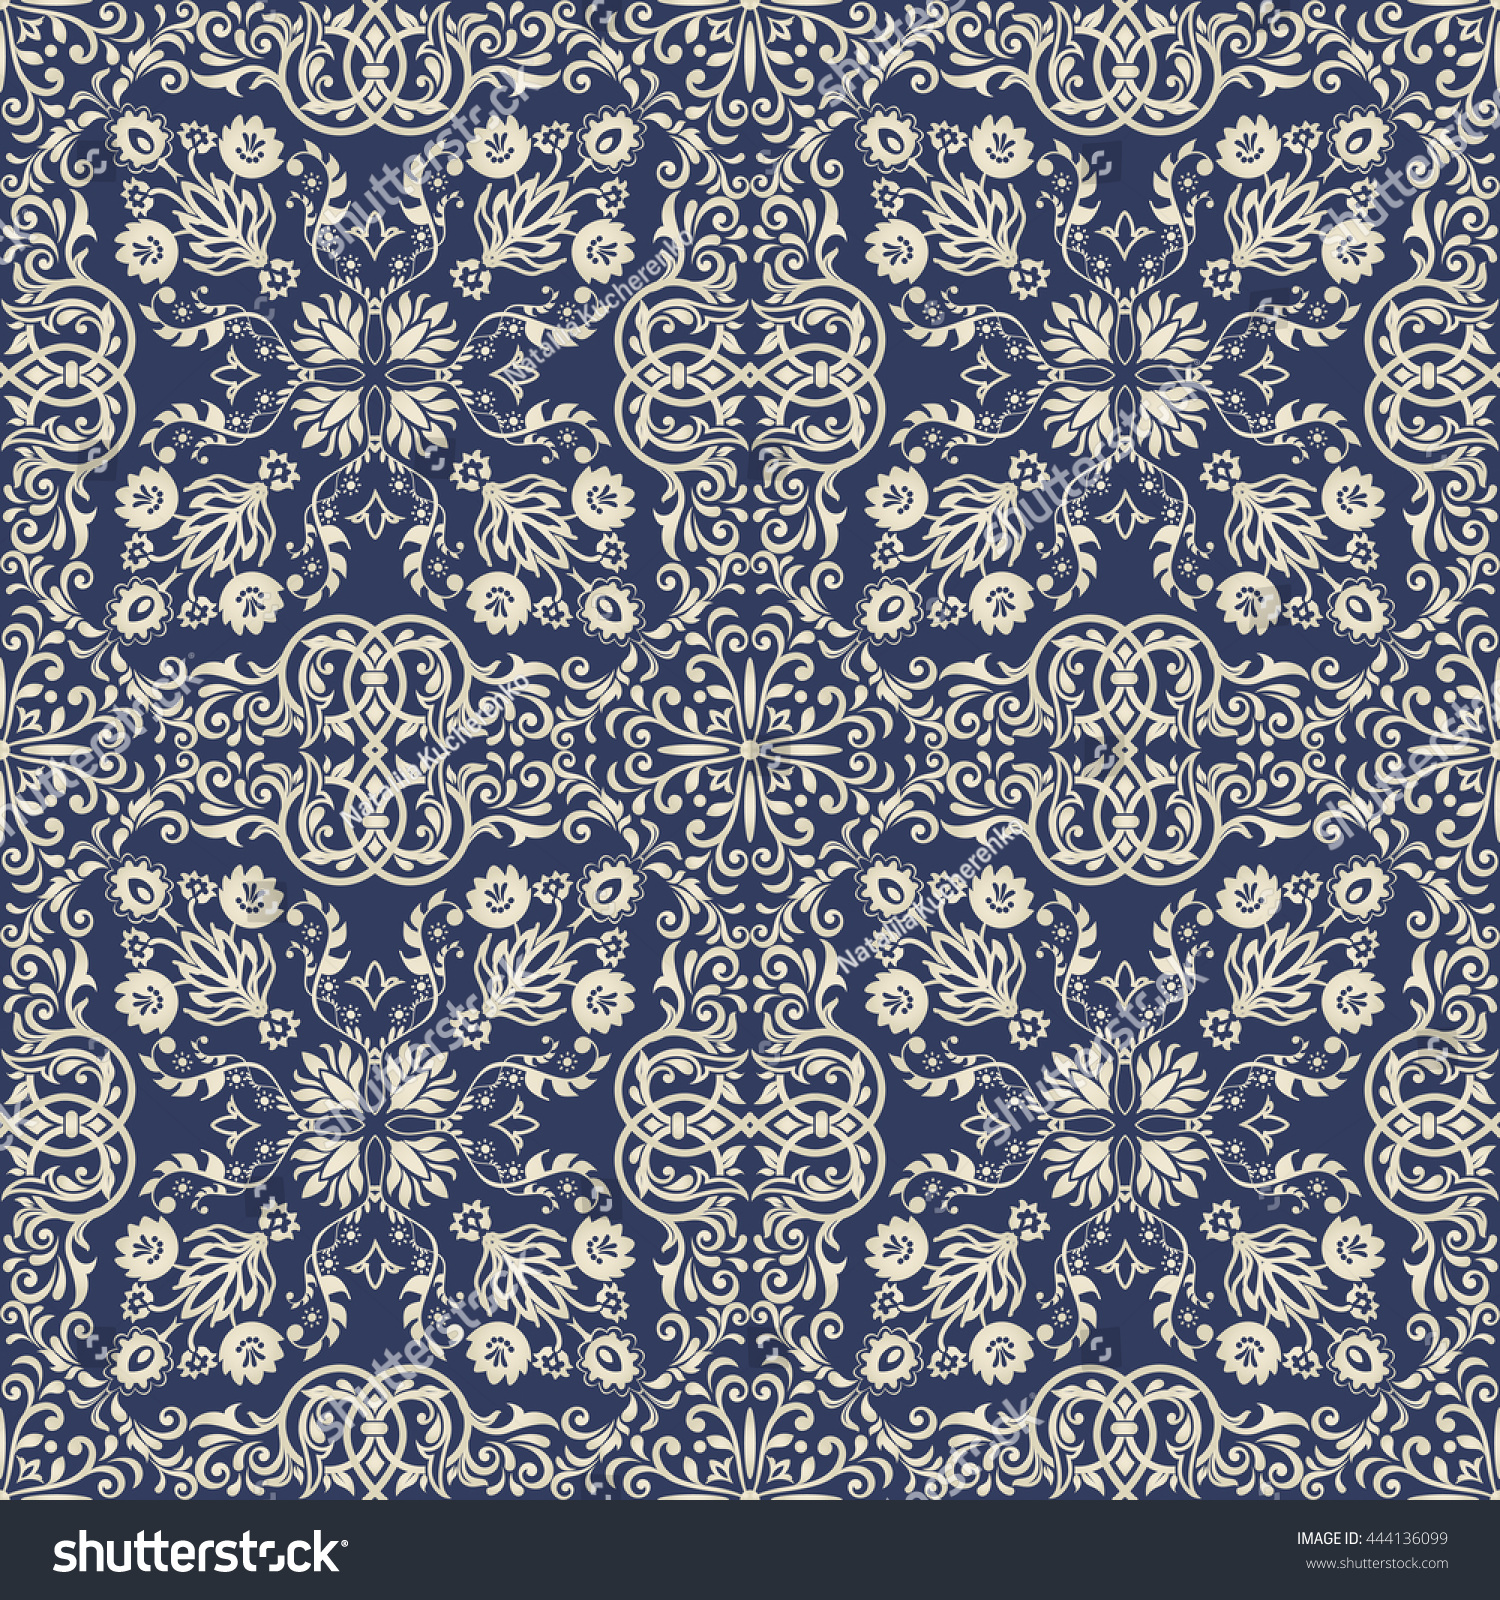 seamless damask pattern dark blue gold stock vector seamless damask pattern in dark blue and